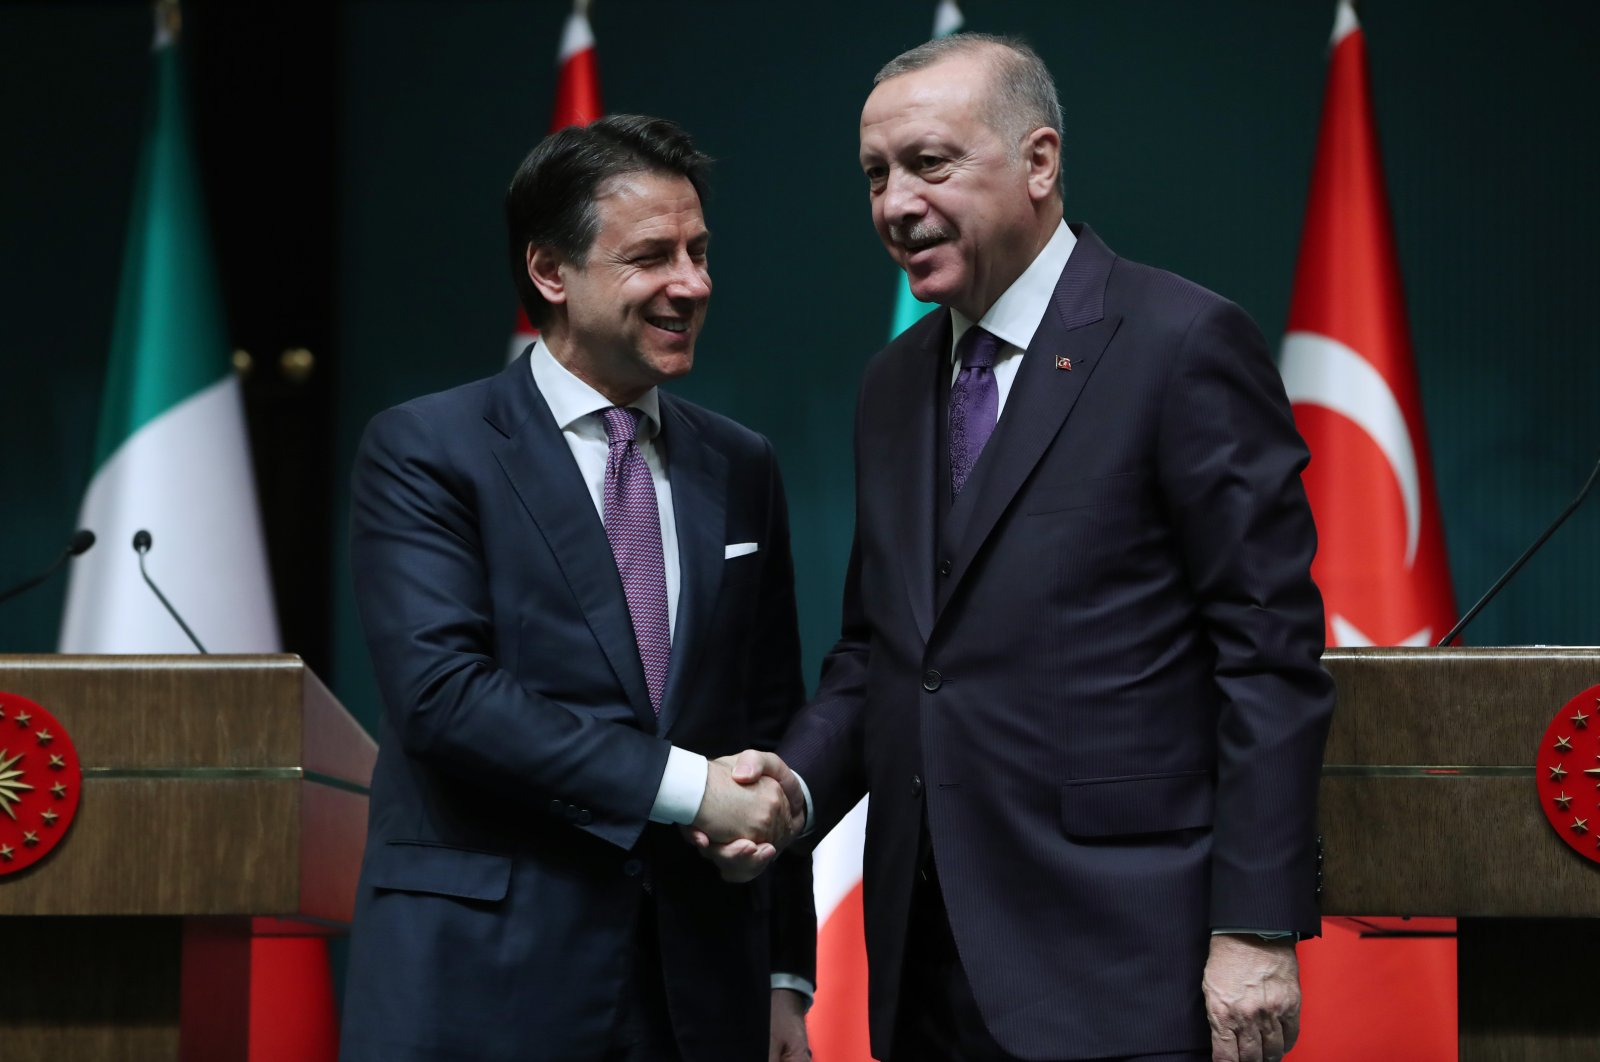 President Recep Tayyip Erdoğan shakes hand with Italian Prime Minister Giuseppe Conte in Ankara, Jan. 14, 2020. (AA Photo)